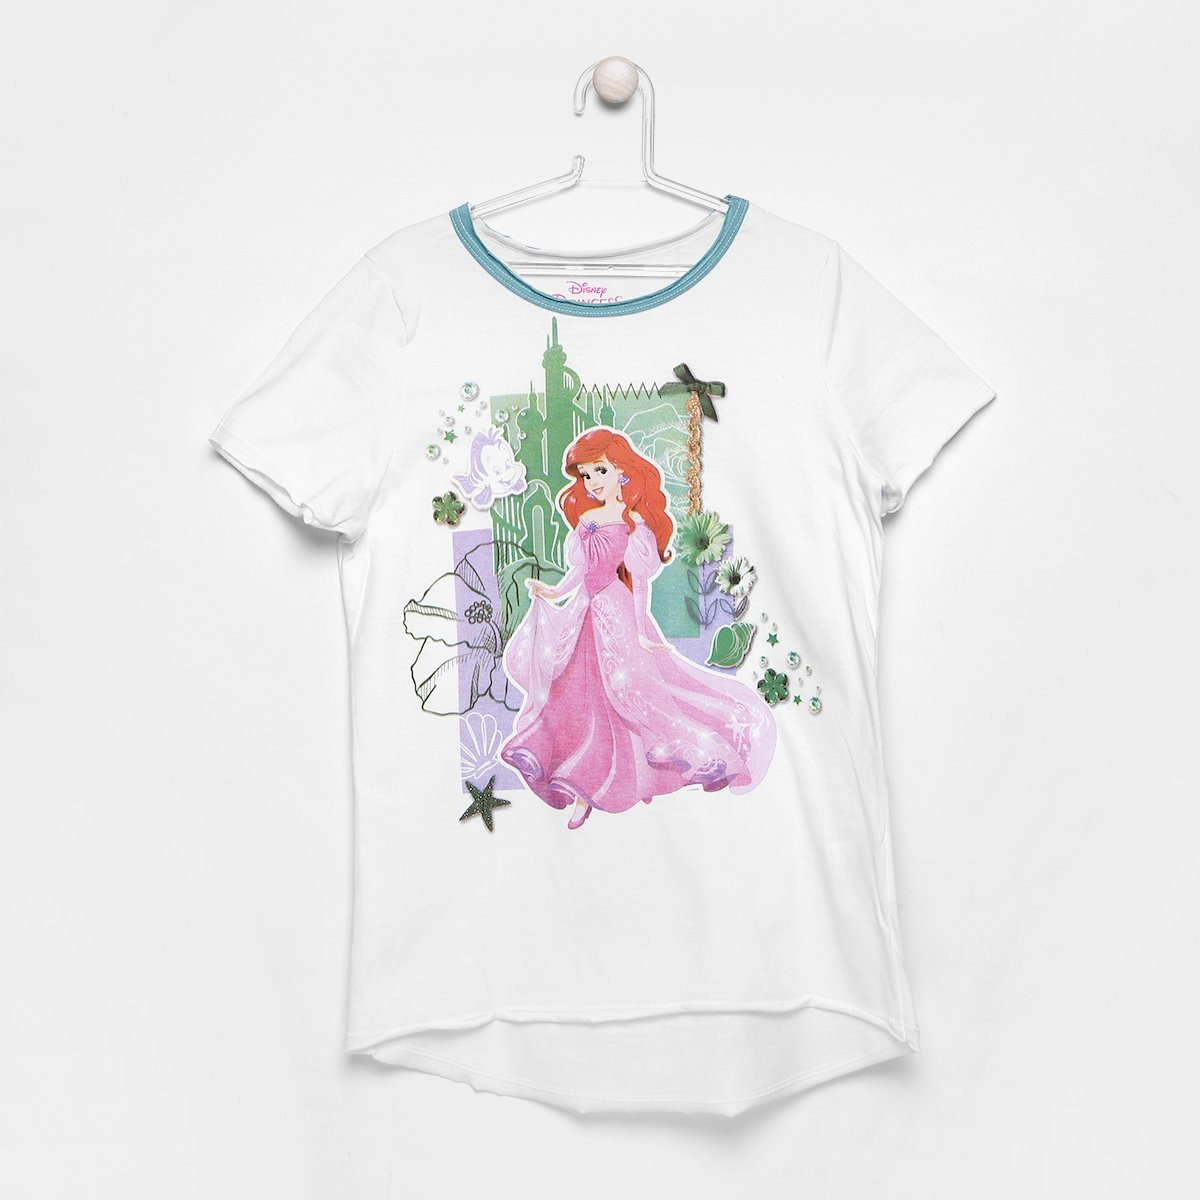 Camiseta Infantil Branco Infantil Disney Ariel Disney Feminina Camiseta Zrtrz